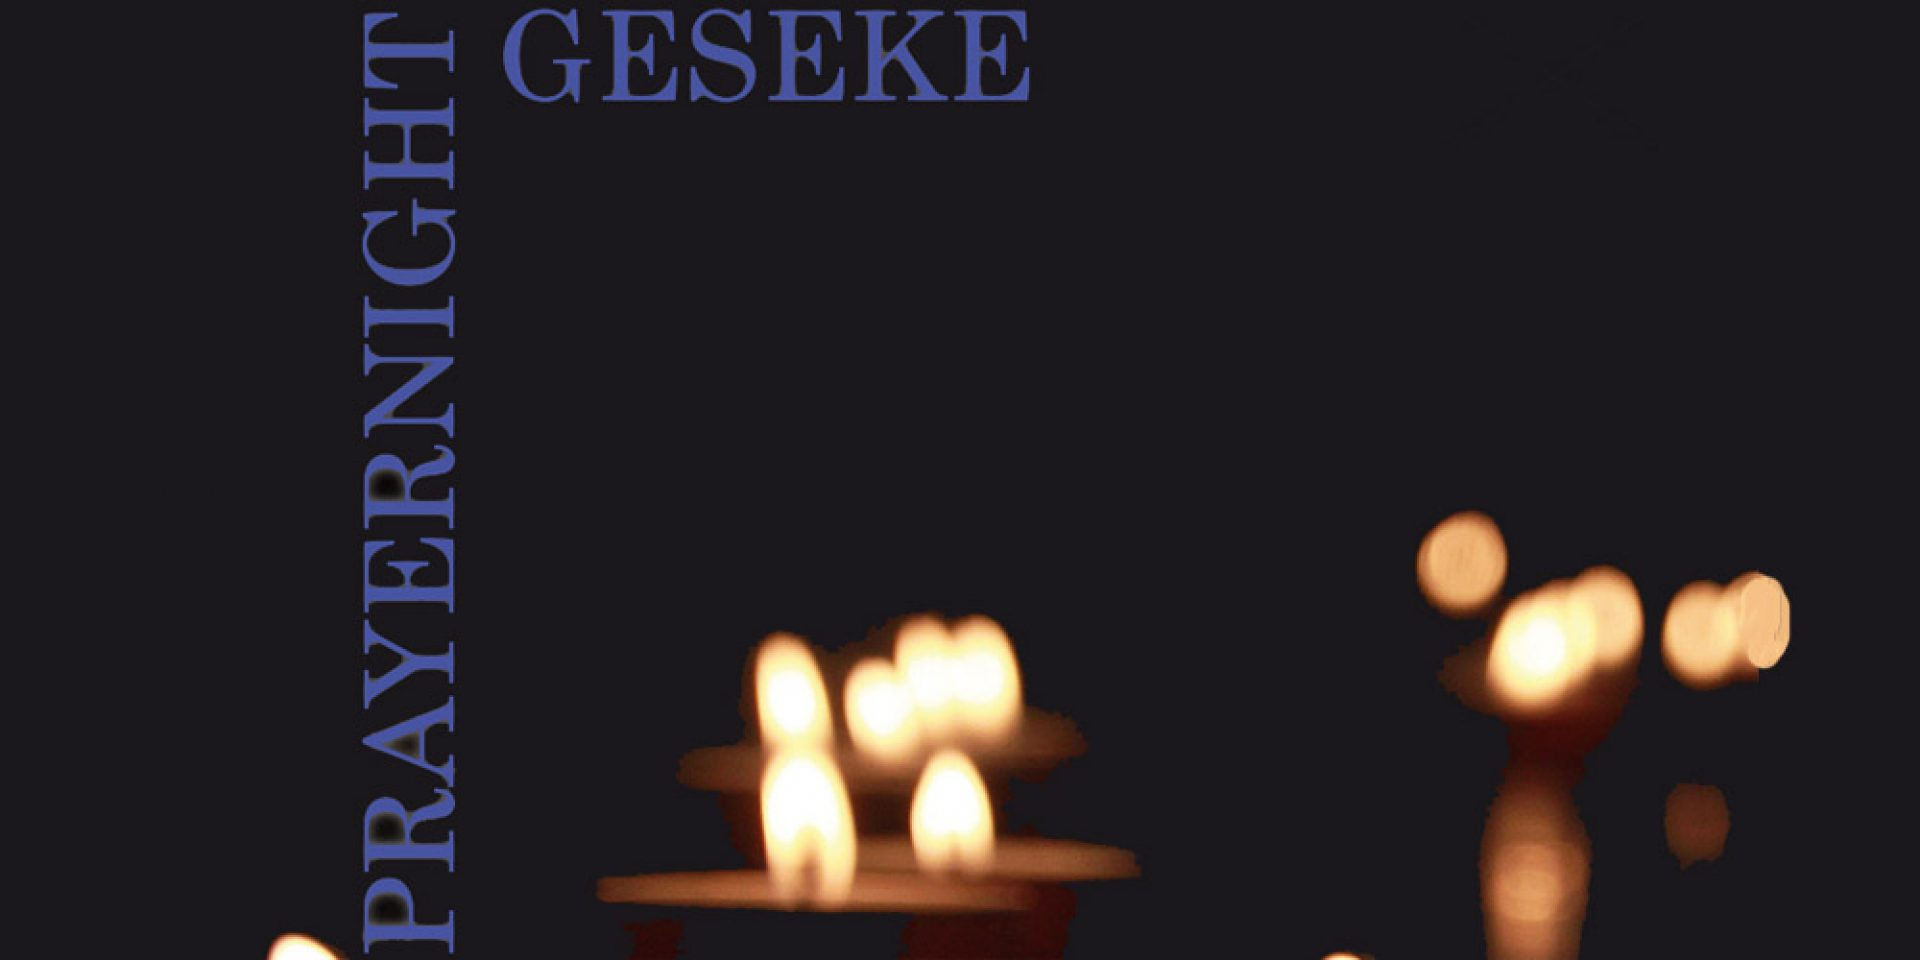 Prayernight Geseke